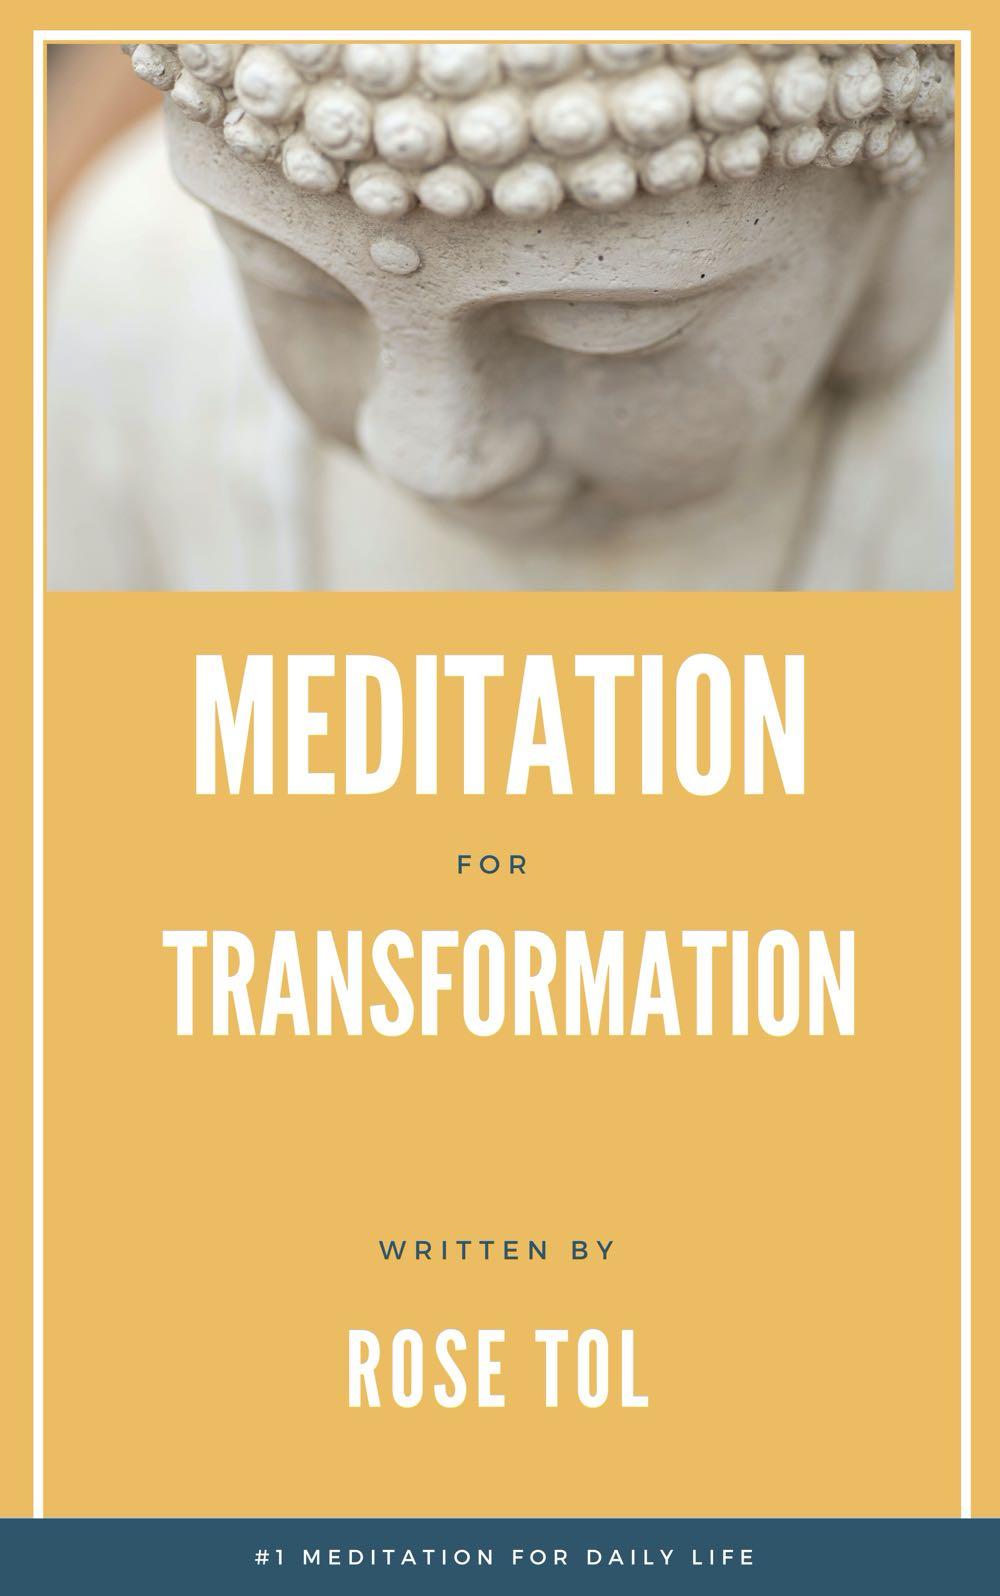 meditation and transformation book